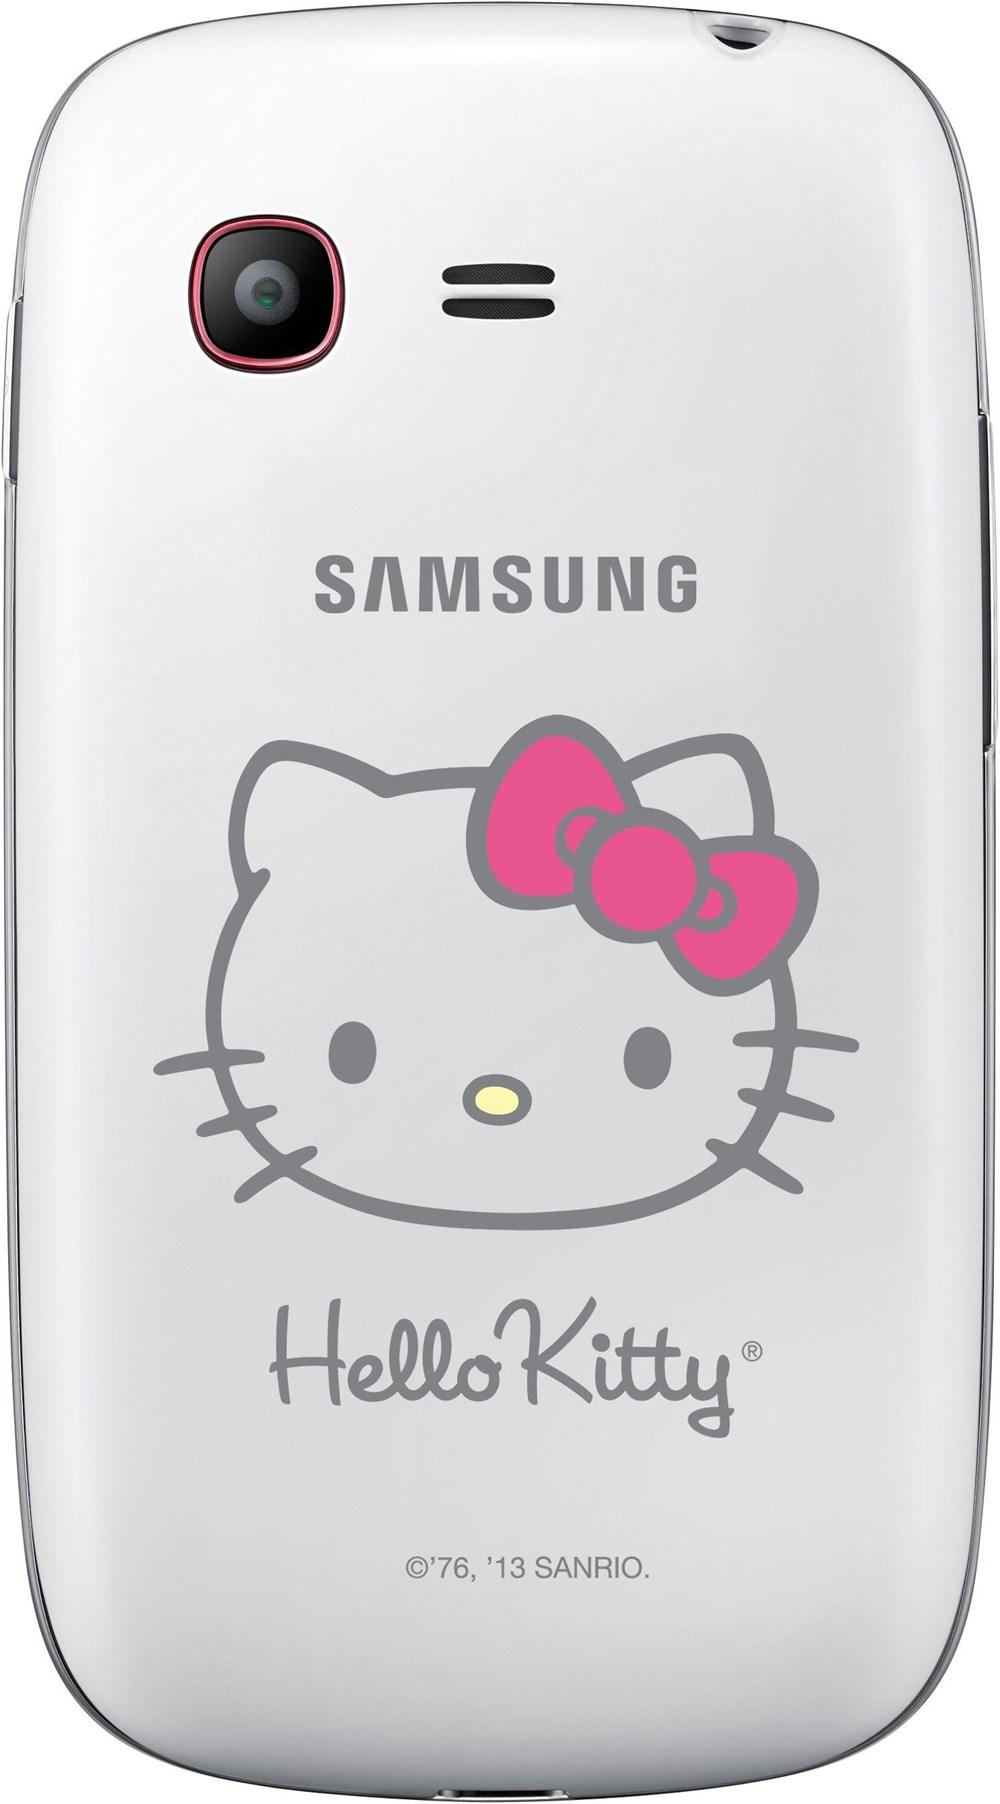 Samsung Galaxy Pocket Neo S5310 Android 4GB Hello Kitty Edition GT-S5310KWHDBT